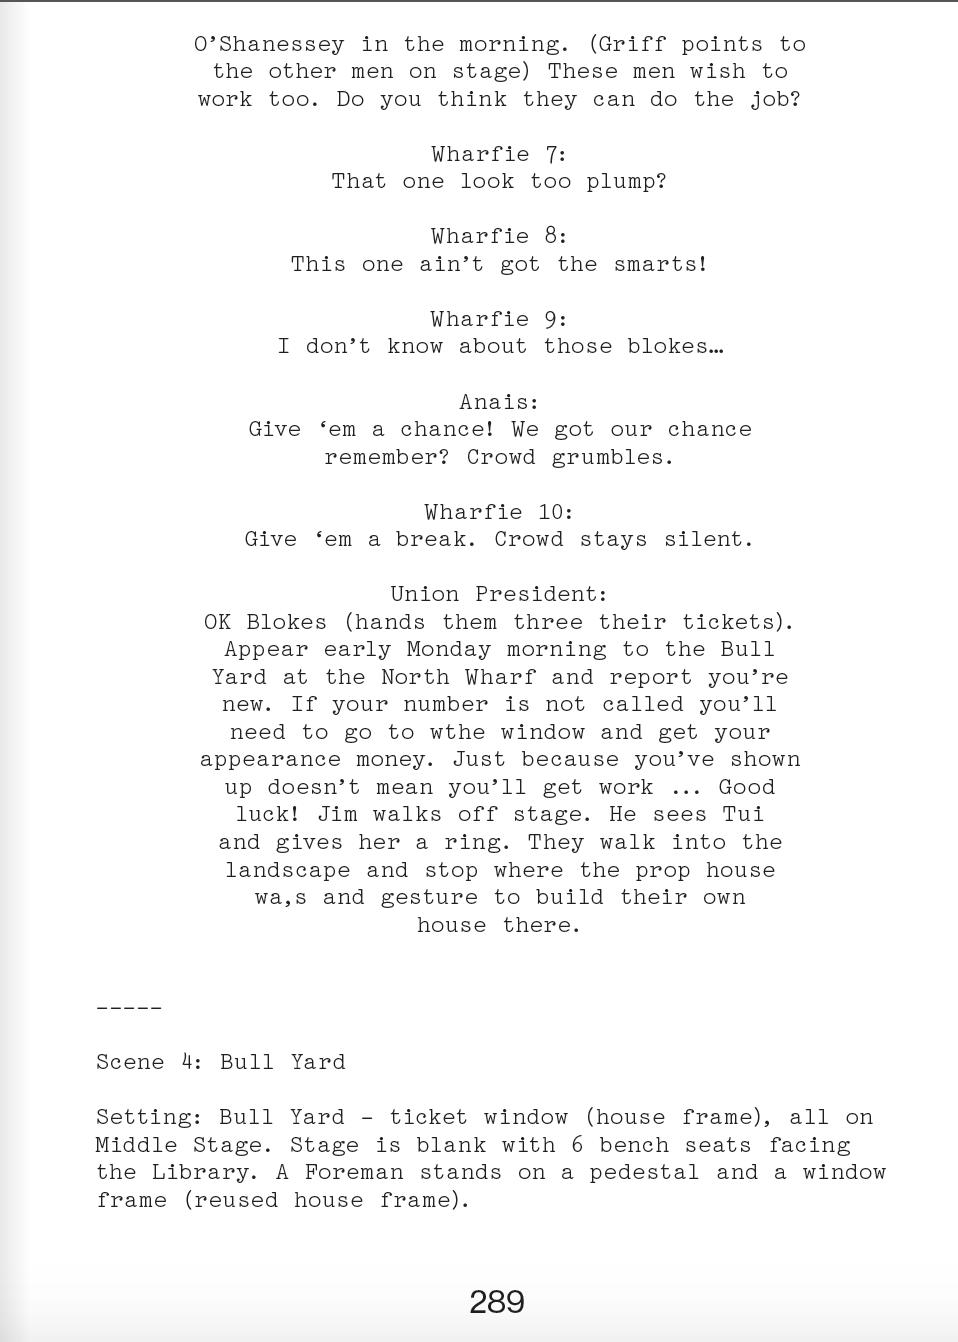 Script Book 8.png